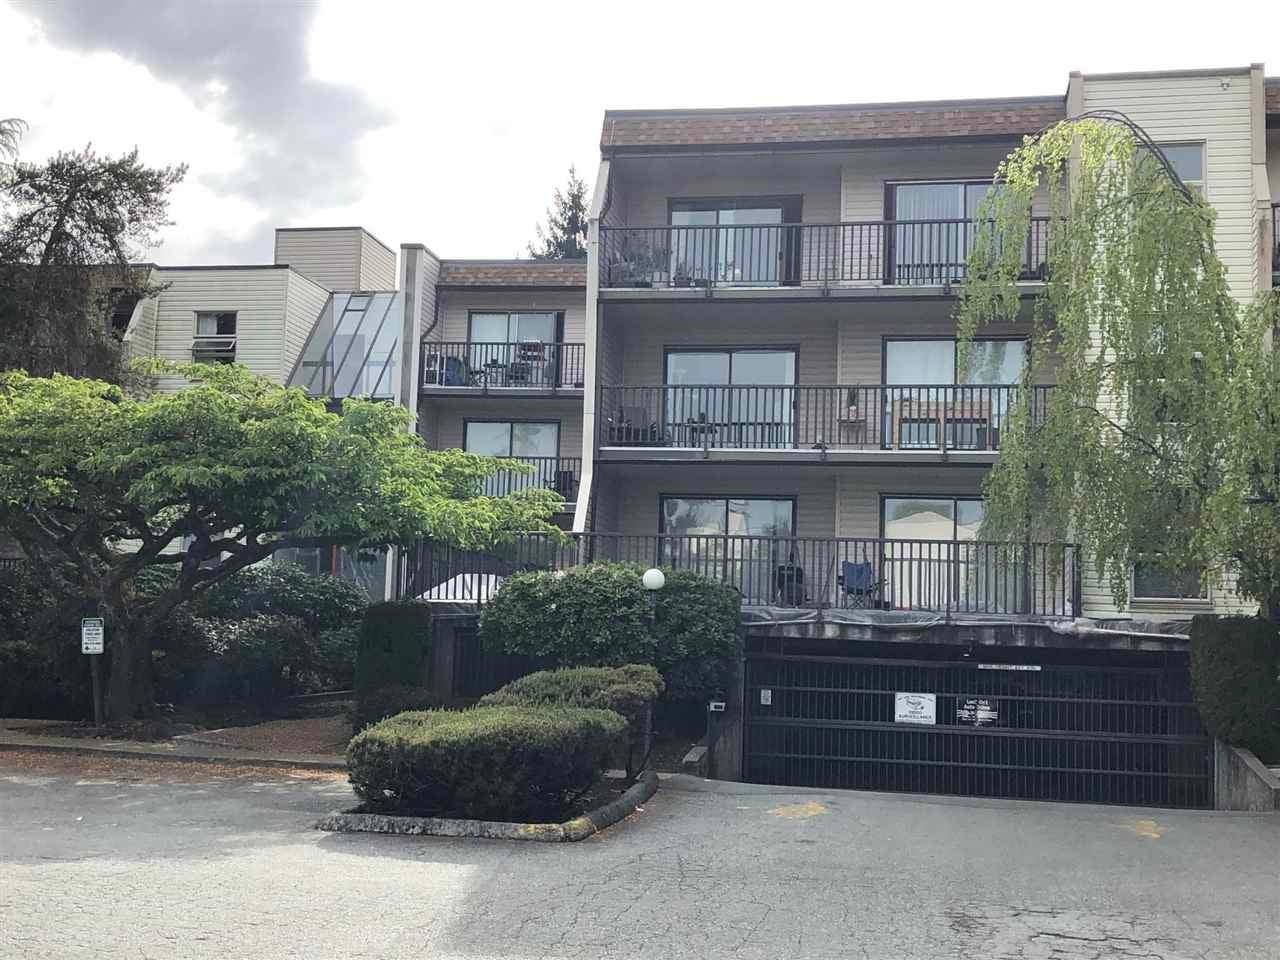 304 15238 100 AVENUE - Guildford Apartment/Condo for sale, 1 Bedroom (R2576105) - #1